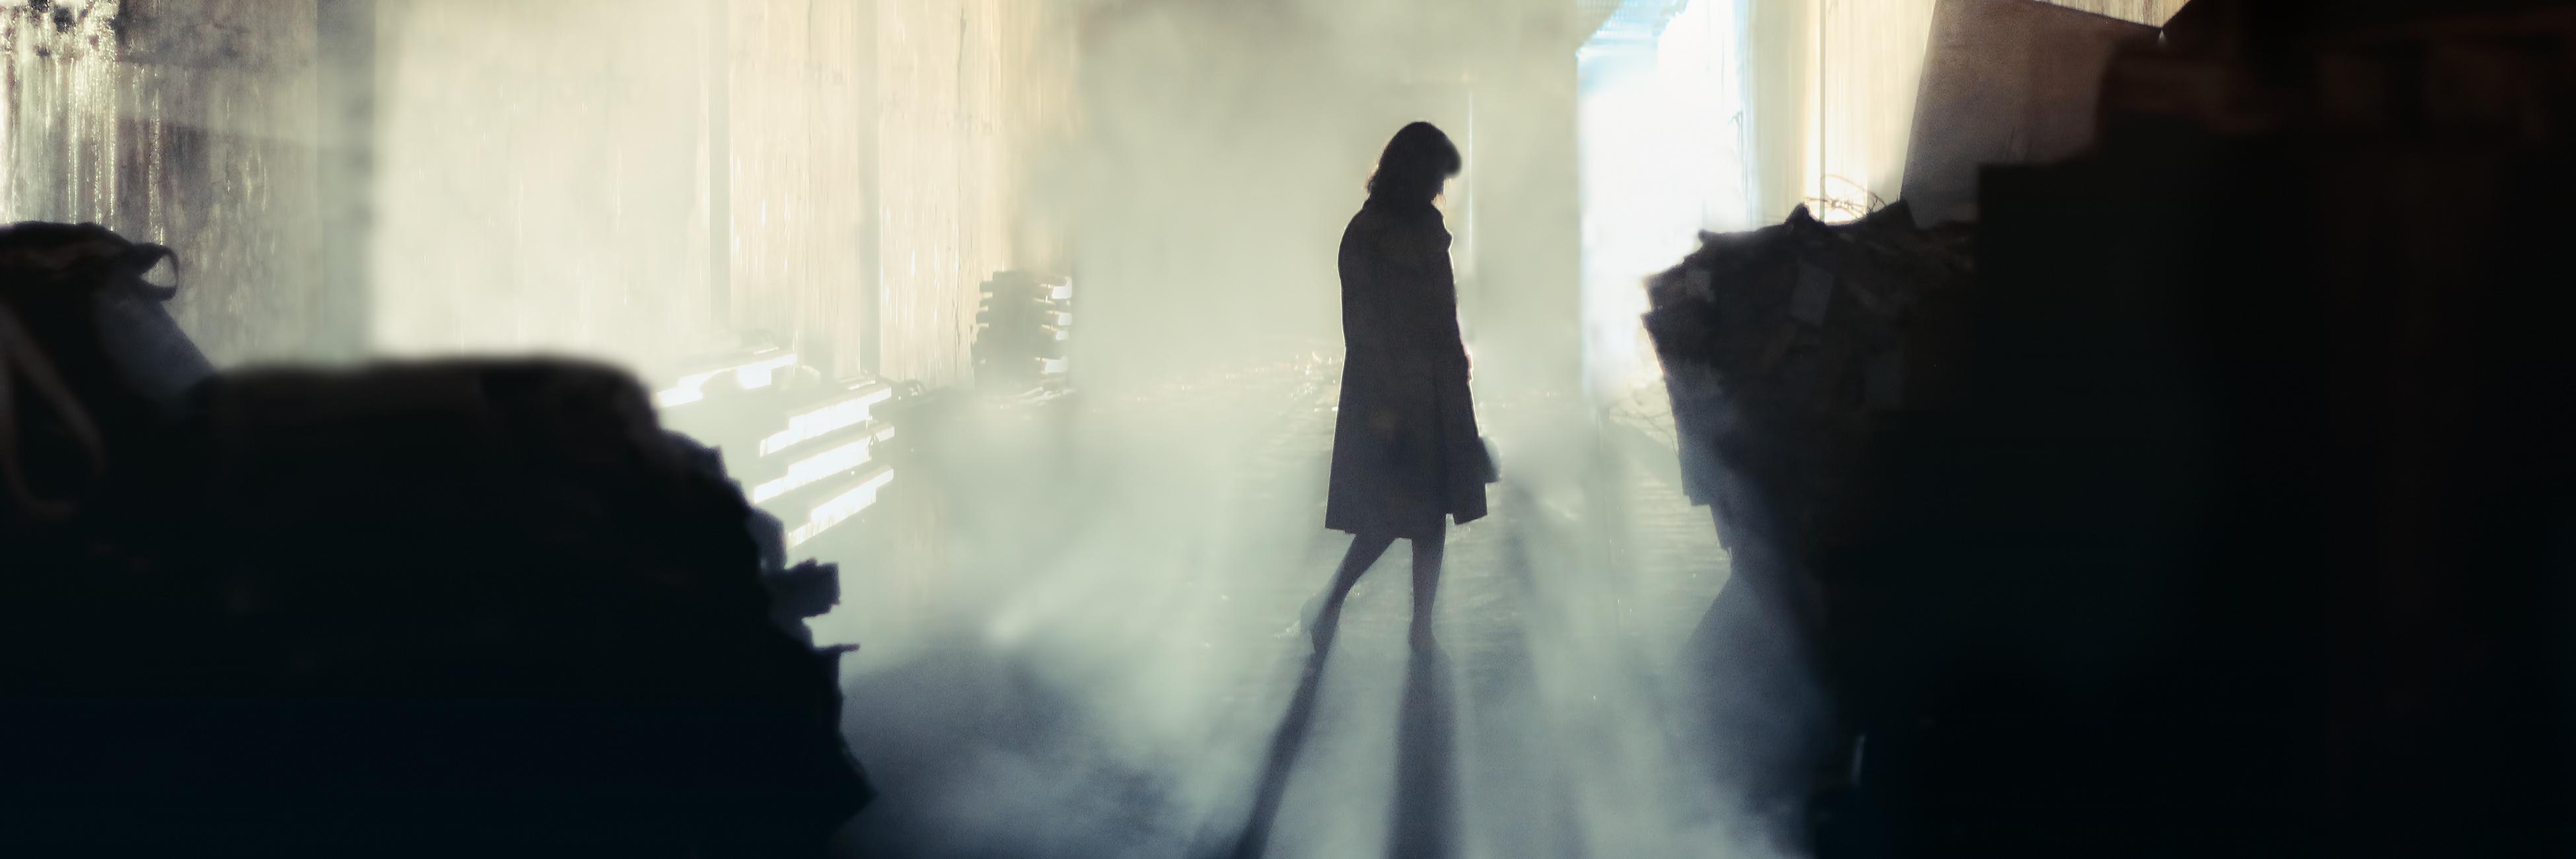 lone woman standing in misty tunnel